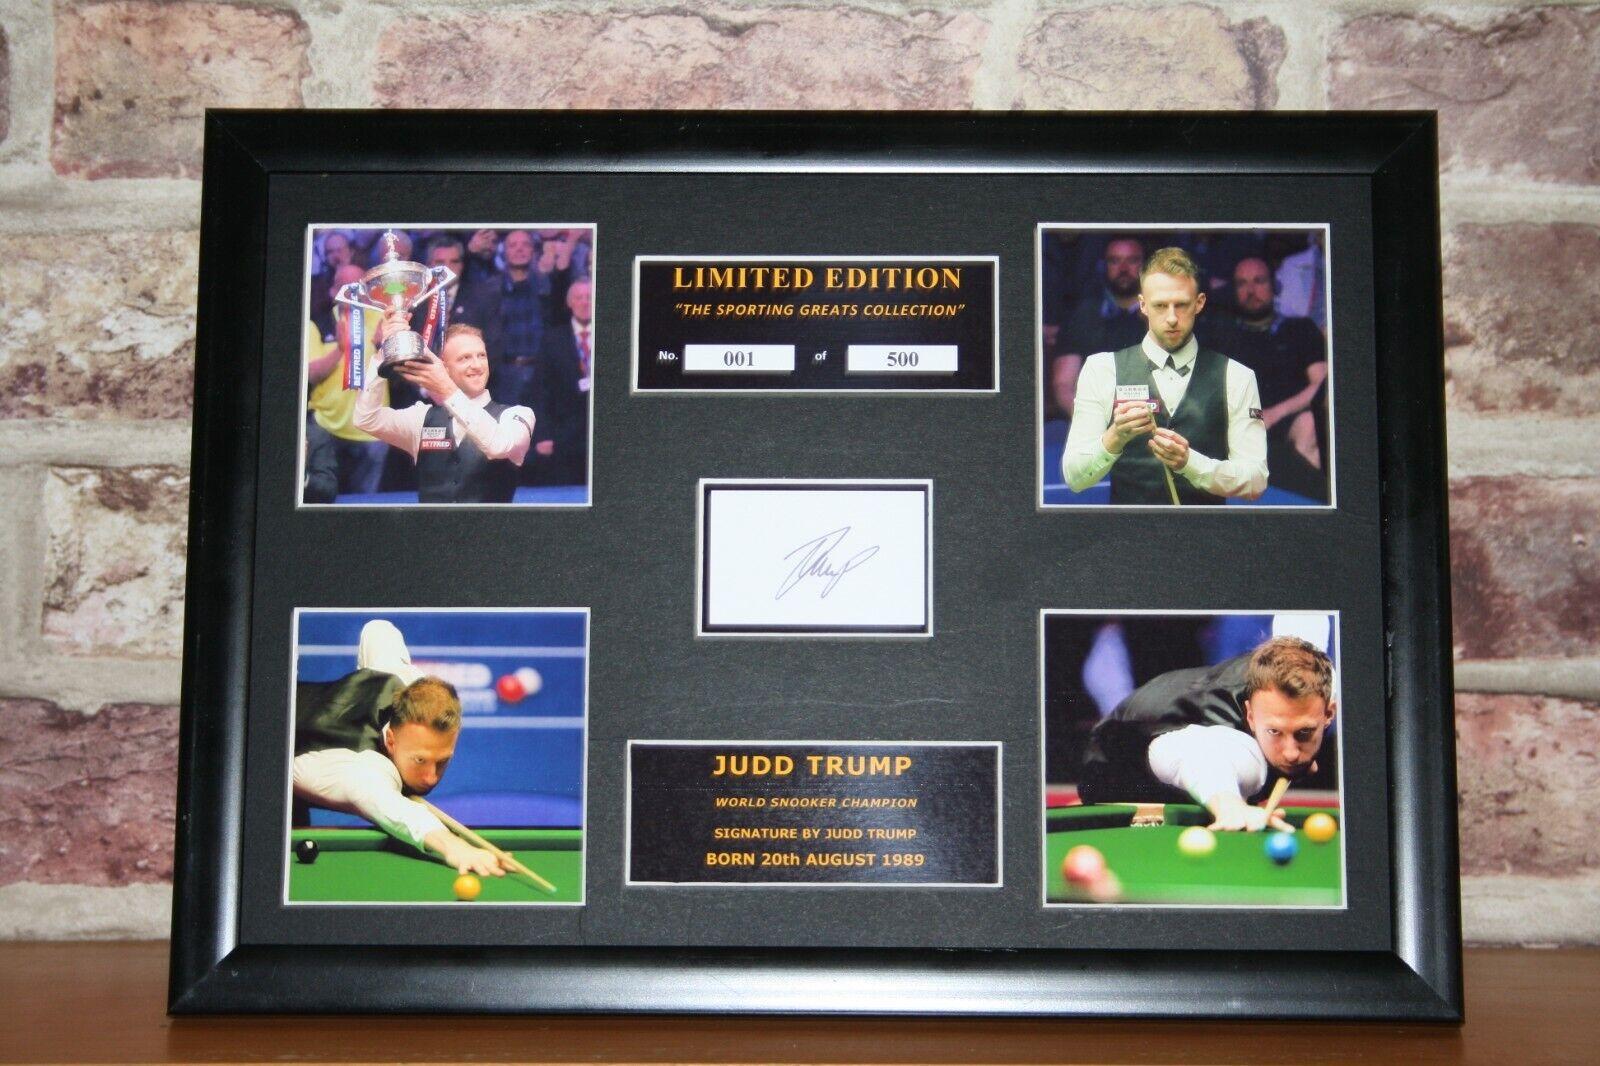 Judd Trump Signed Ltd Edition Framed Picture Memorabilia